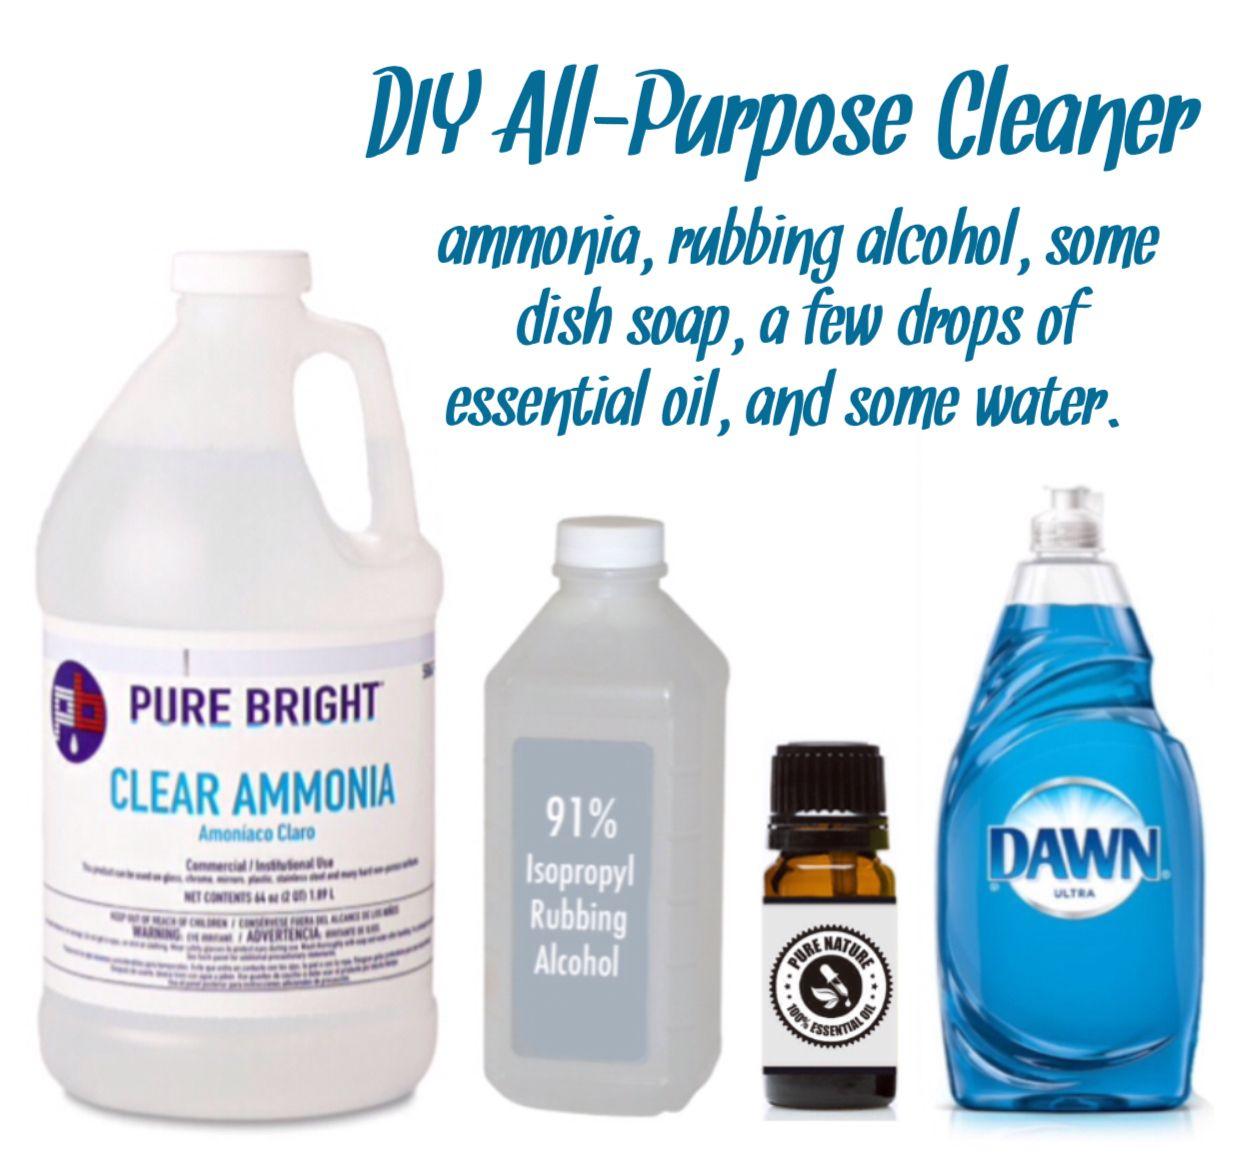 (DIY AllPurpose Cleaner ammonia, rubbing alcohol, some